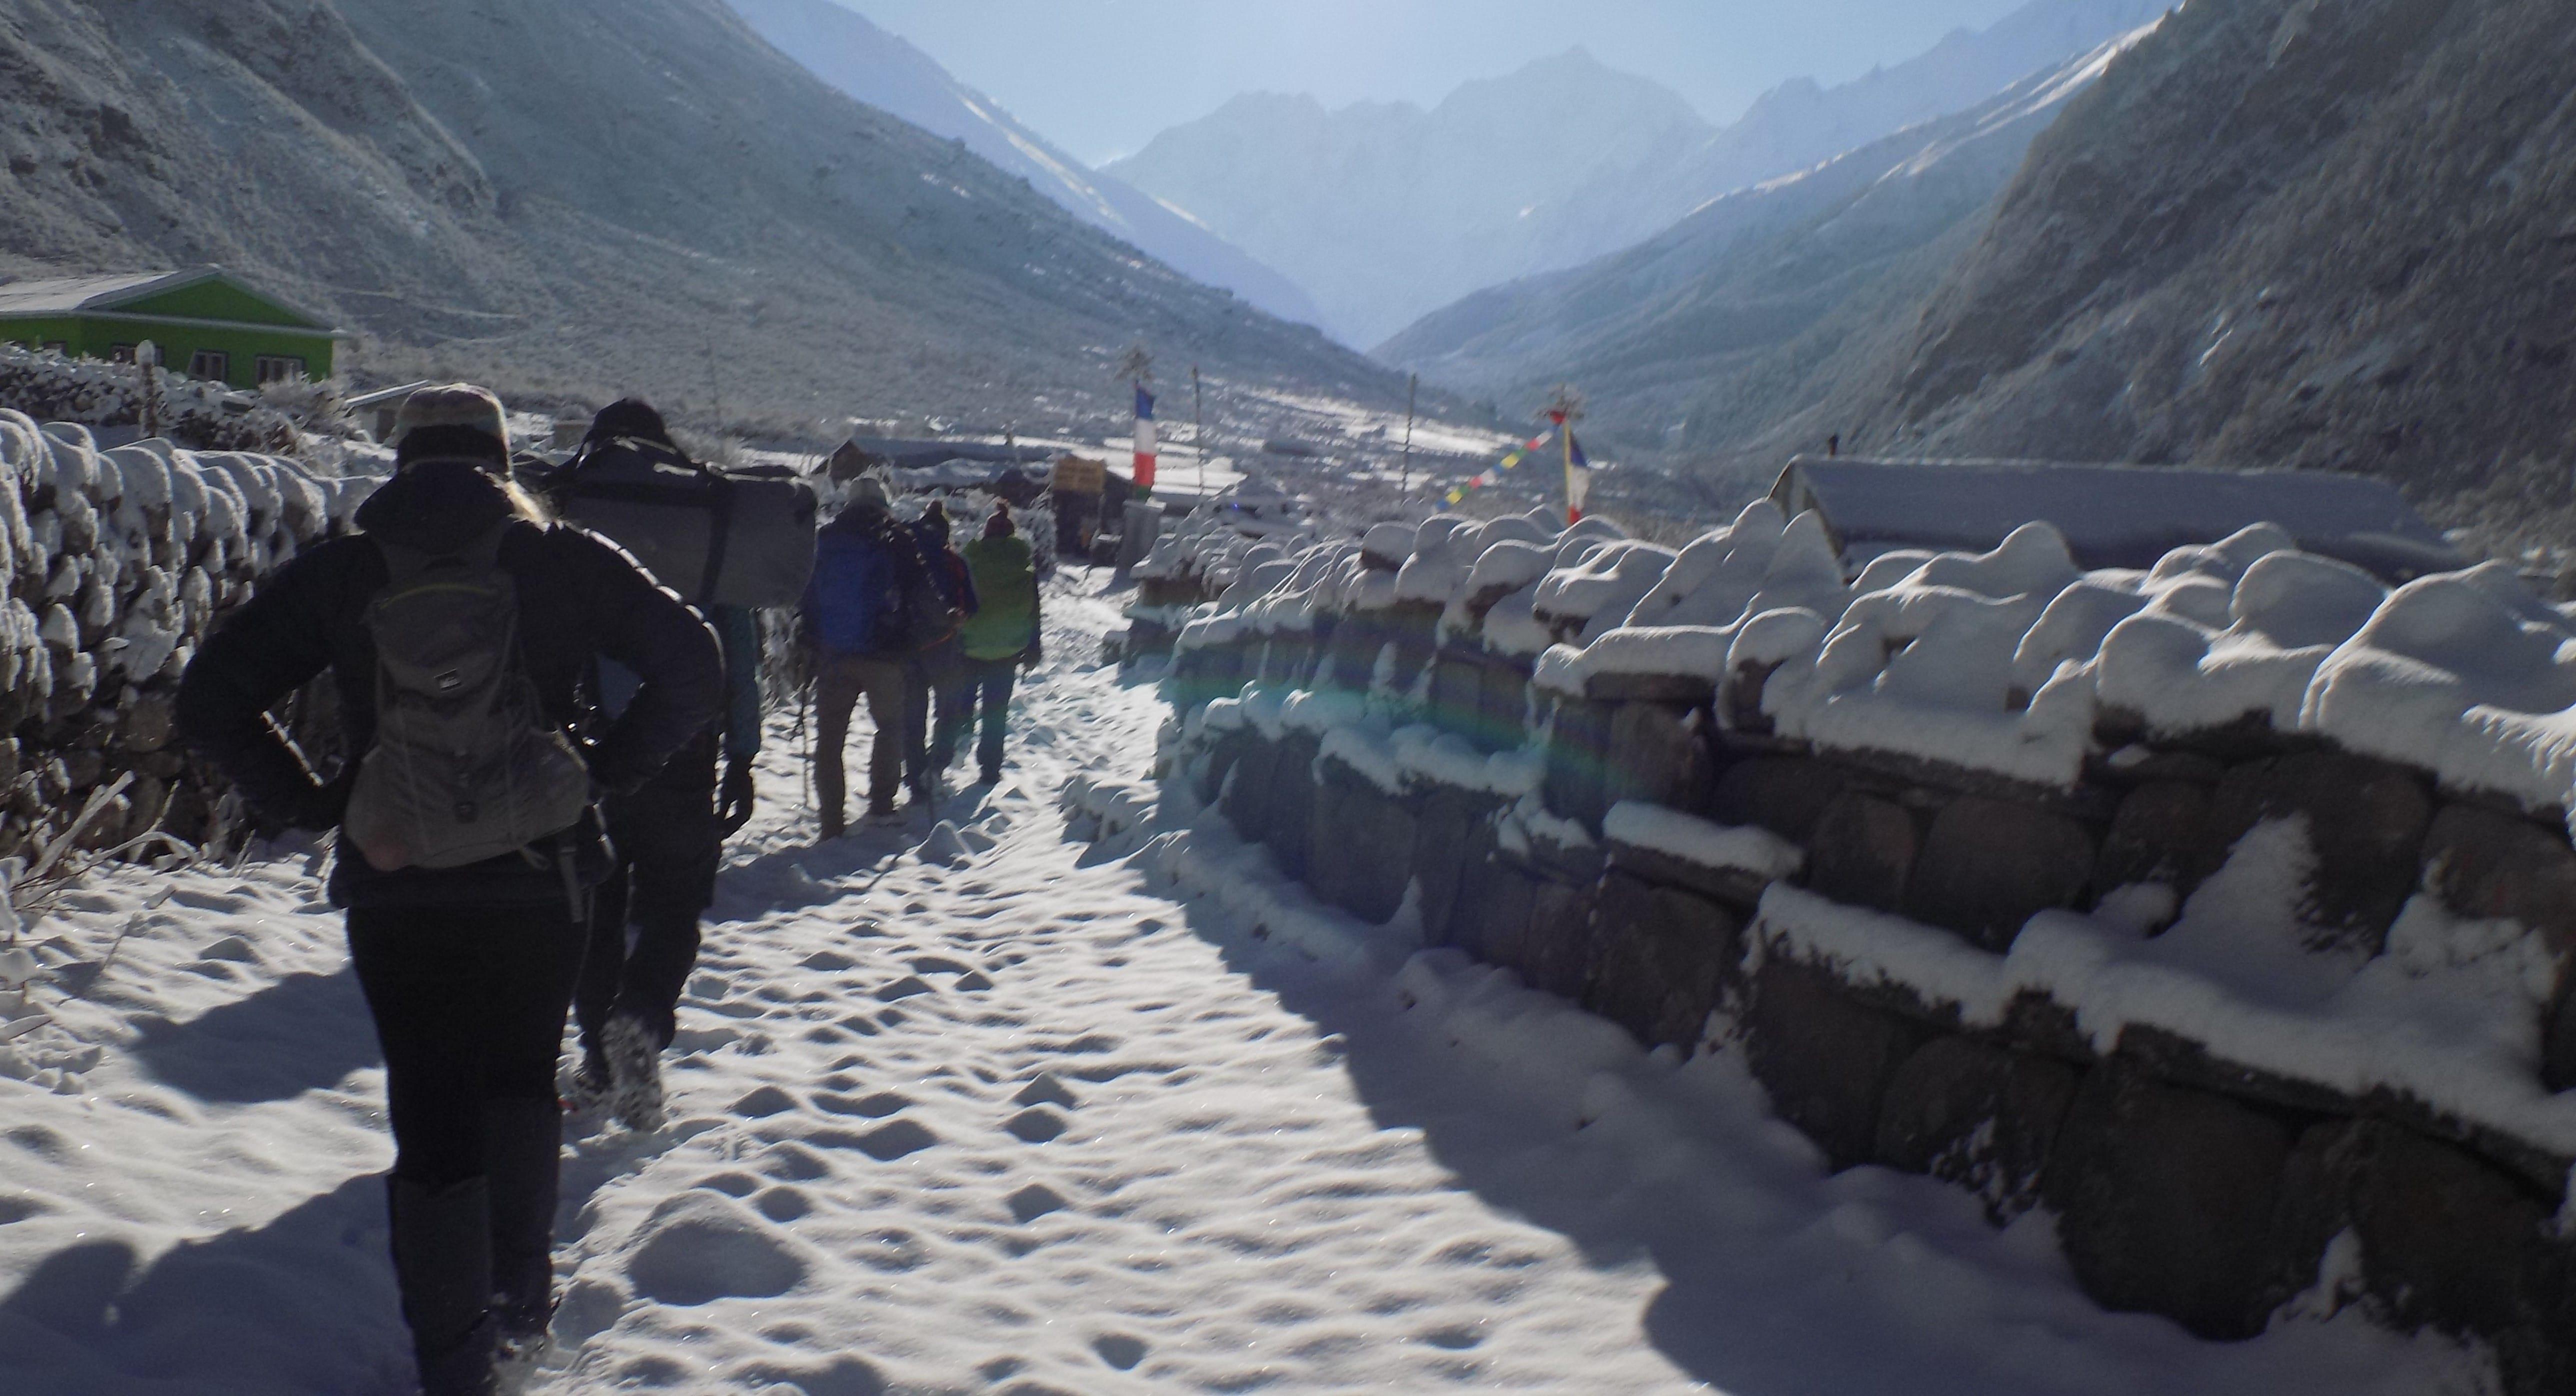 Langtang Gosaikunda trekking route